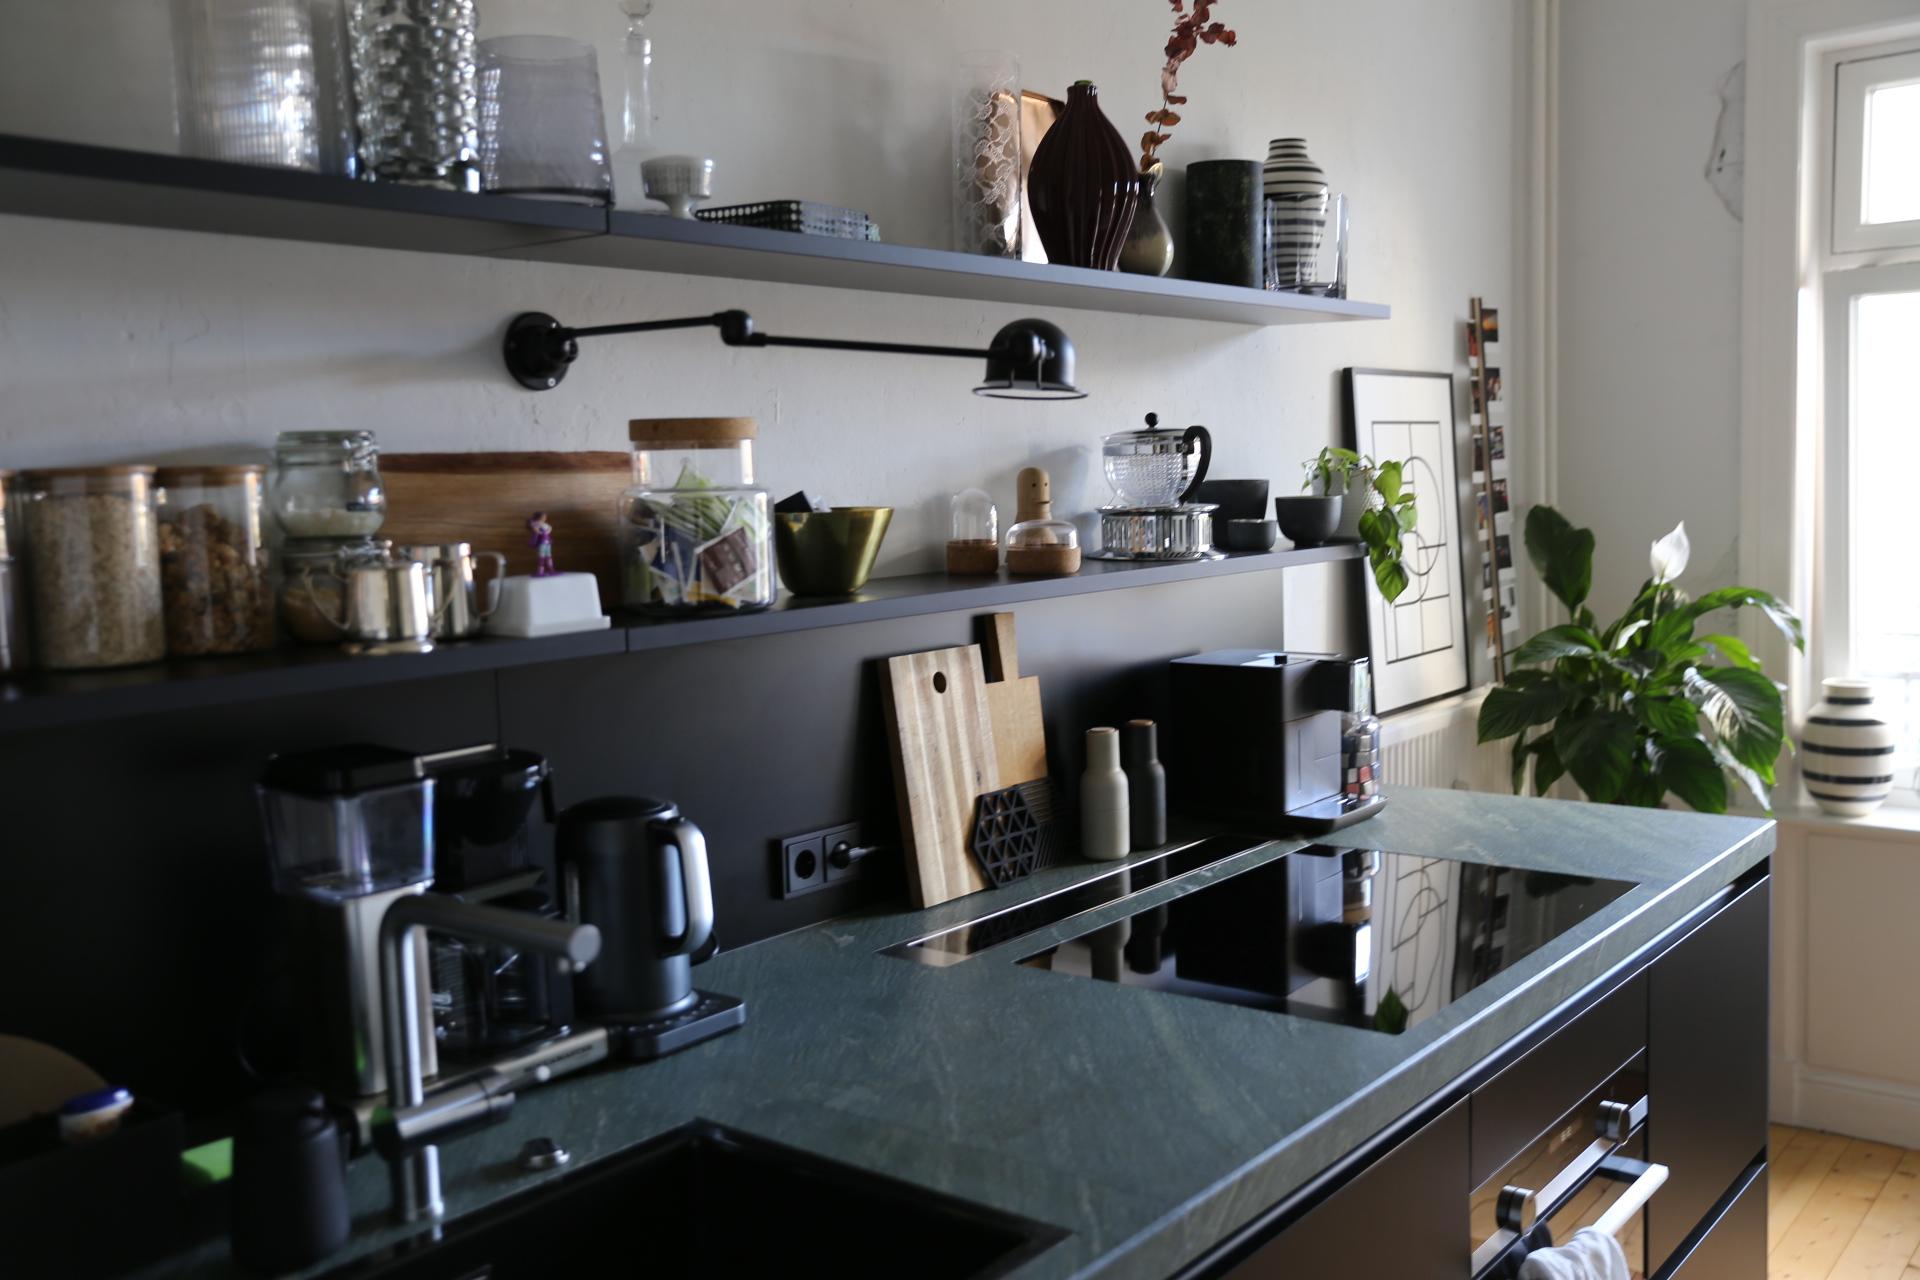 Full Size of Teleskopstange Regal Küche Waschbecken Regal Küche Offenes Regal Küche Obst Und Gemüse Regal Küche Küche Regal Küche